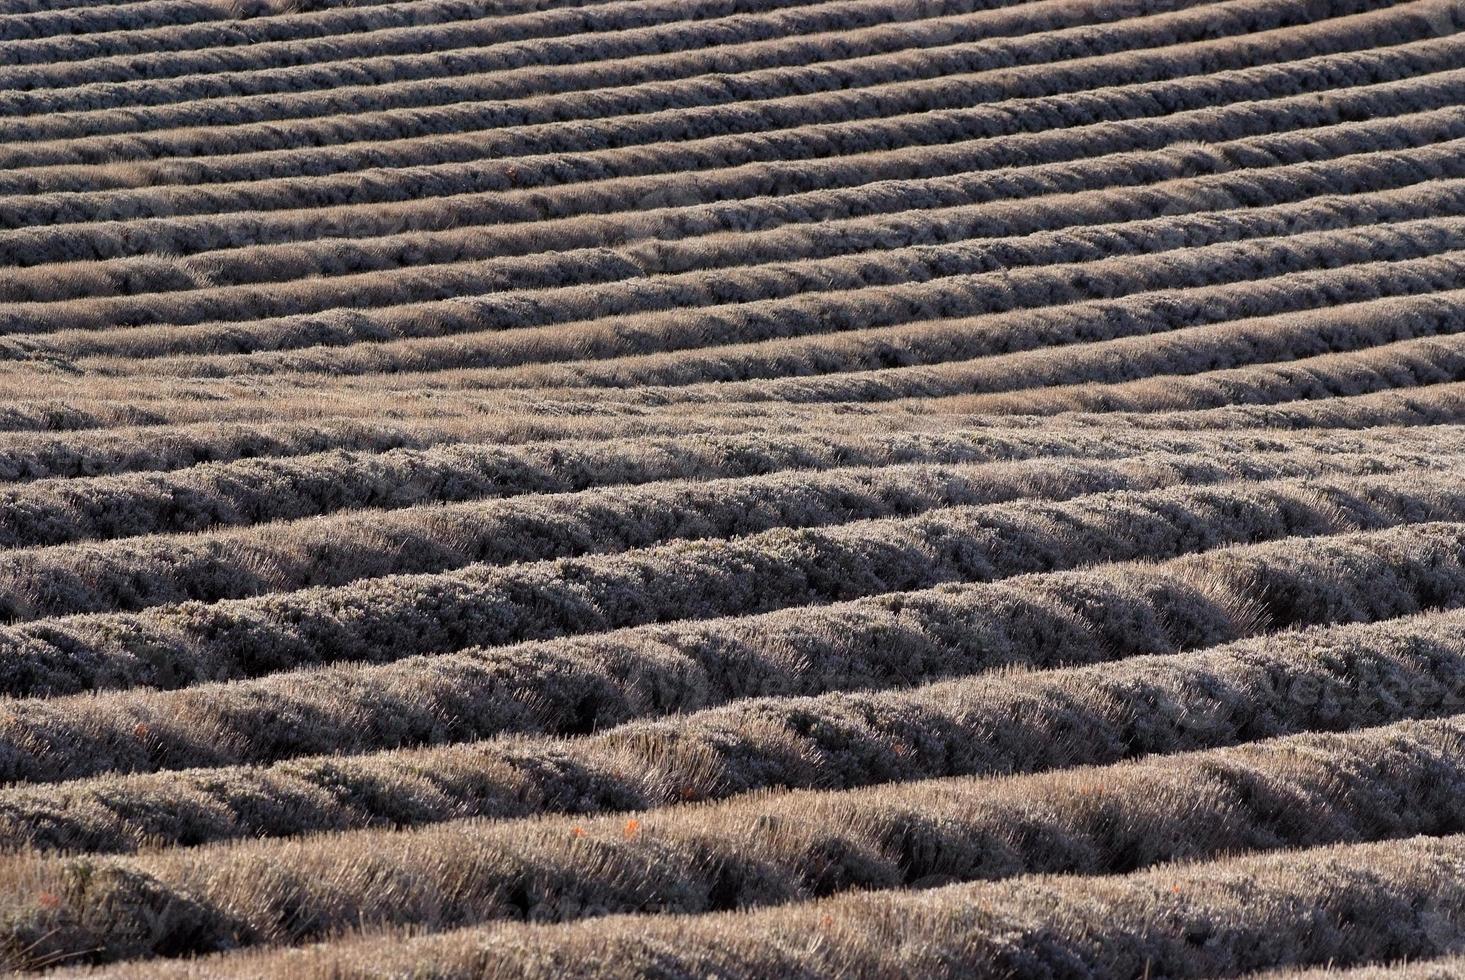 field of lavenders in winters photo